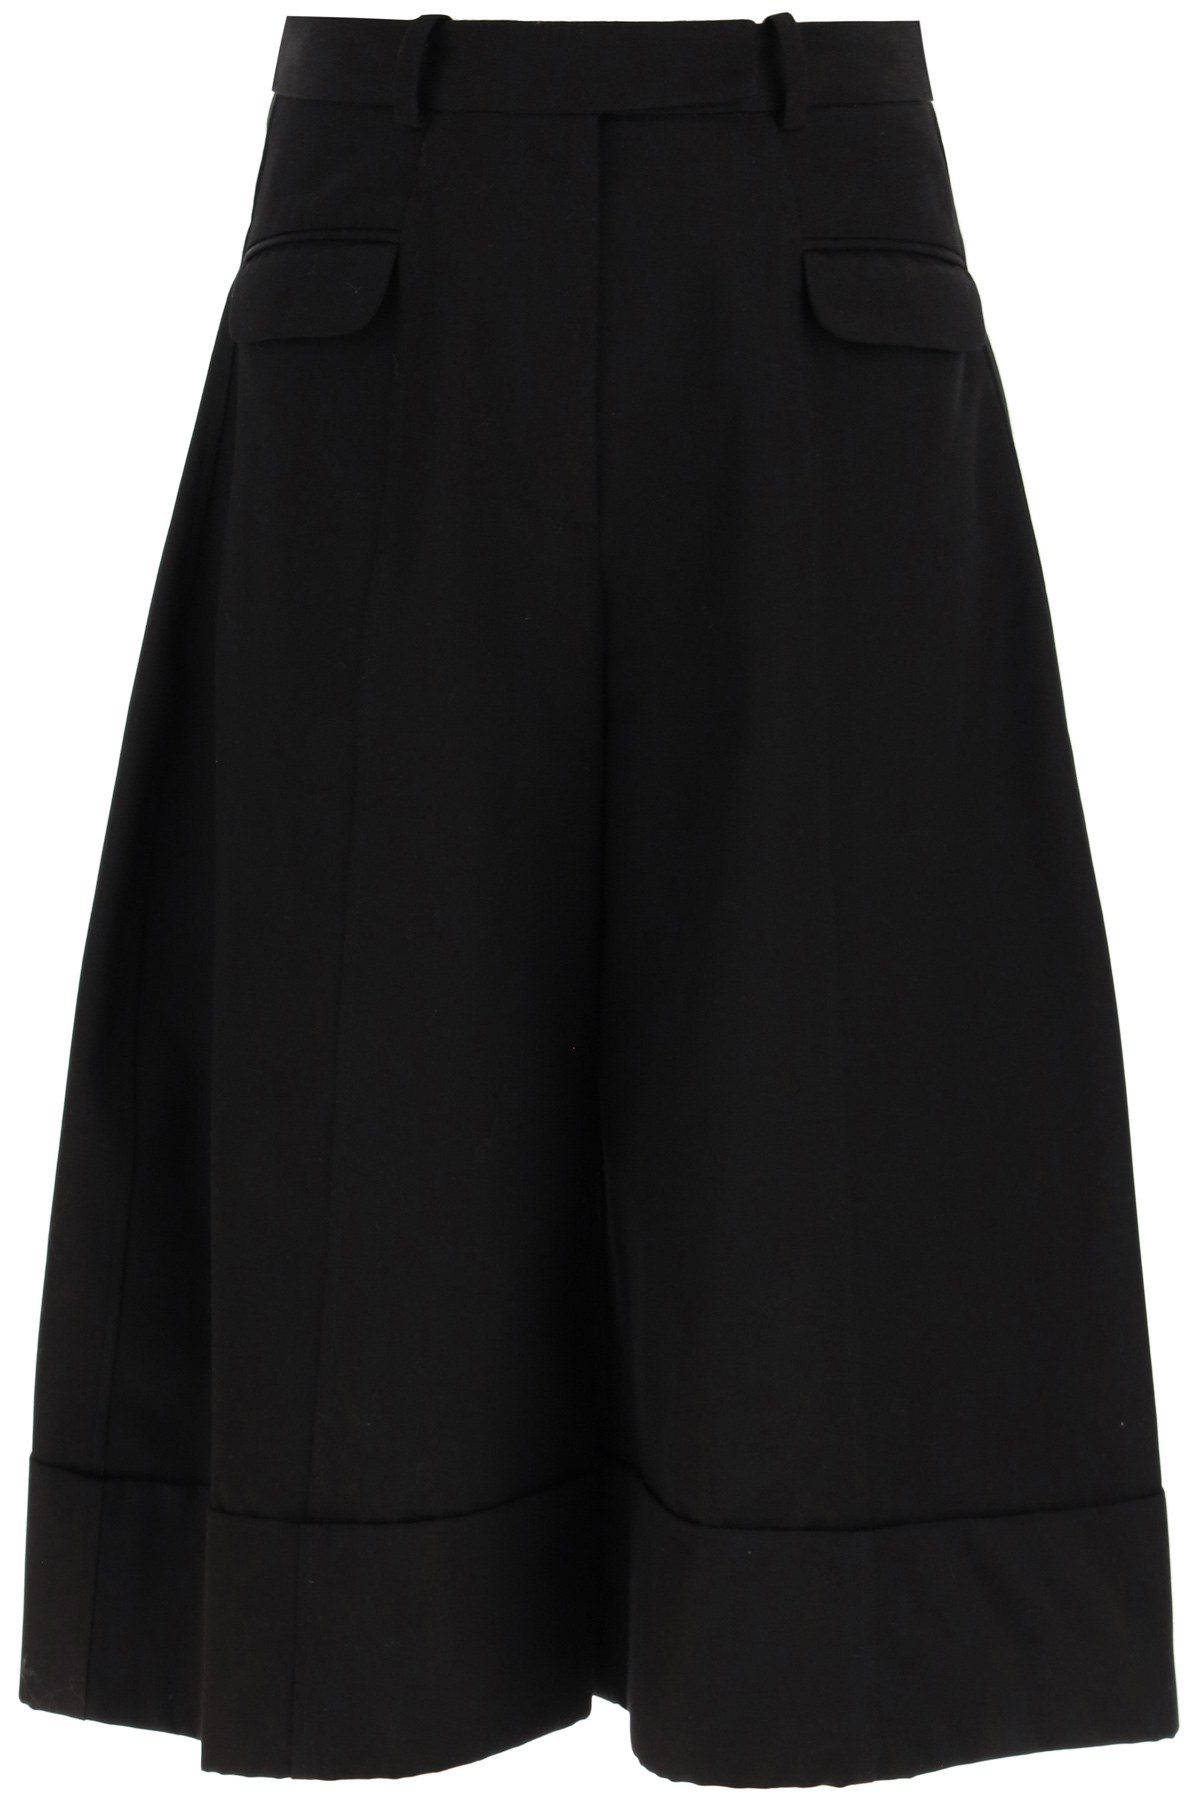 Simone rocha pantaloni culotte sagomati